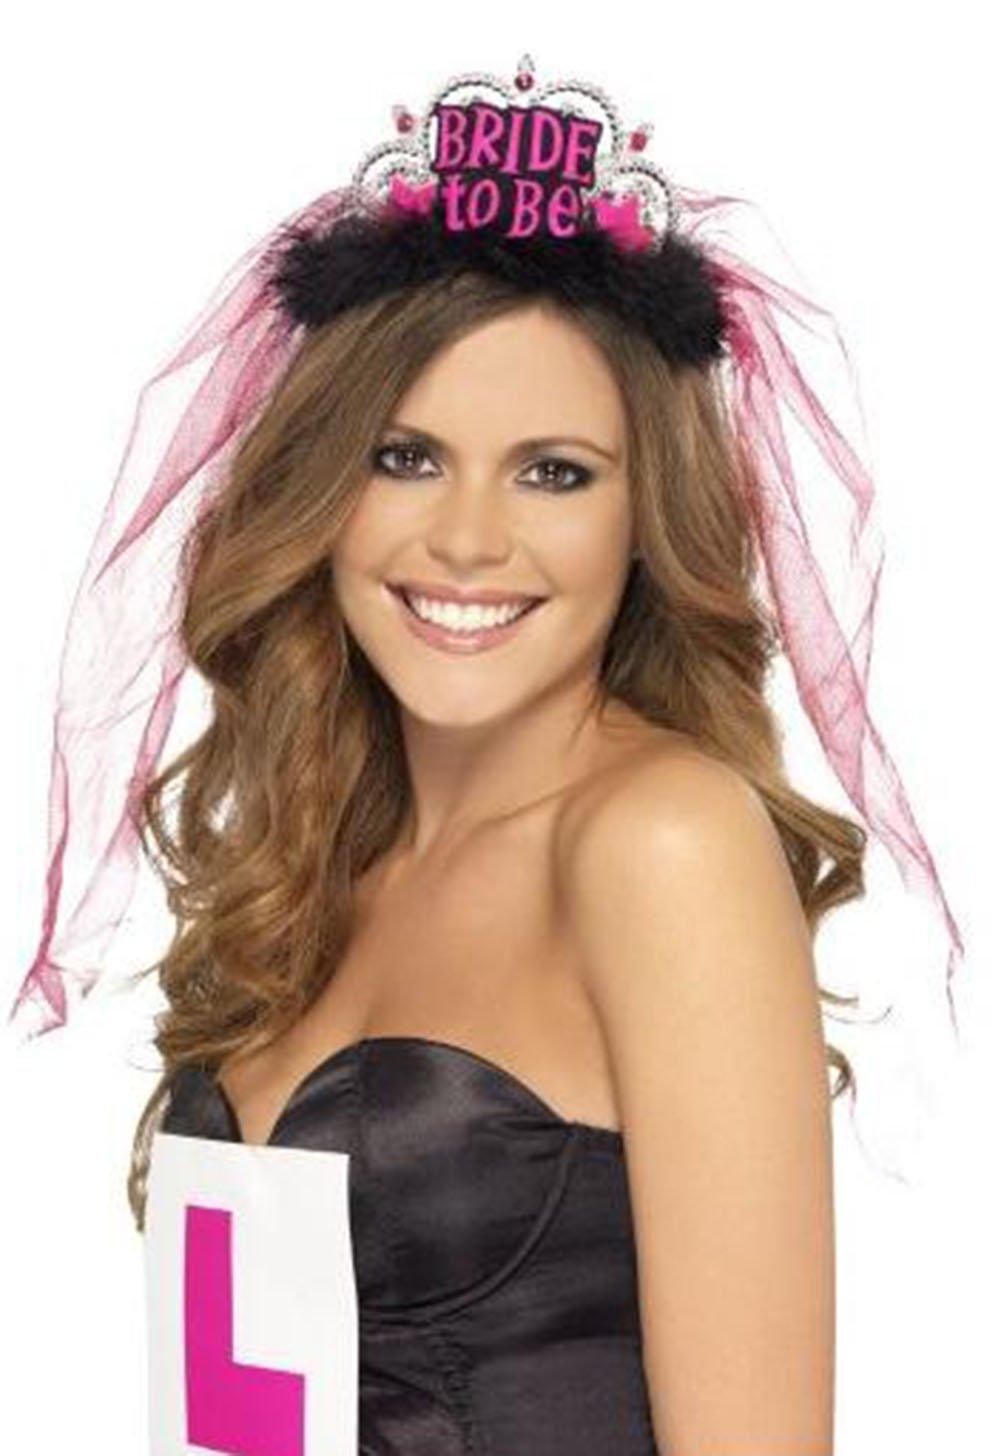 Doitsa Bride To Be Tiara with White Veil Bride Crown Hen Night Party Bridal Shower Decor Black